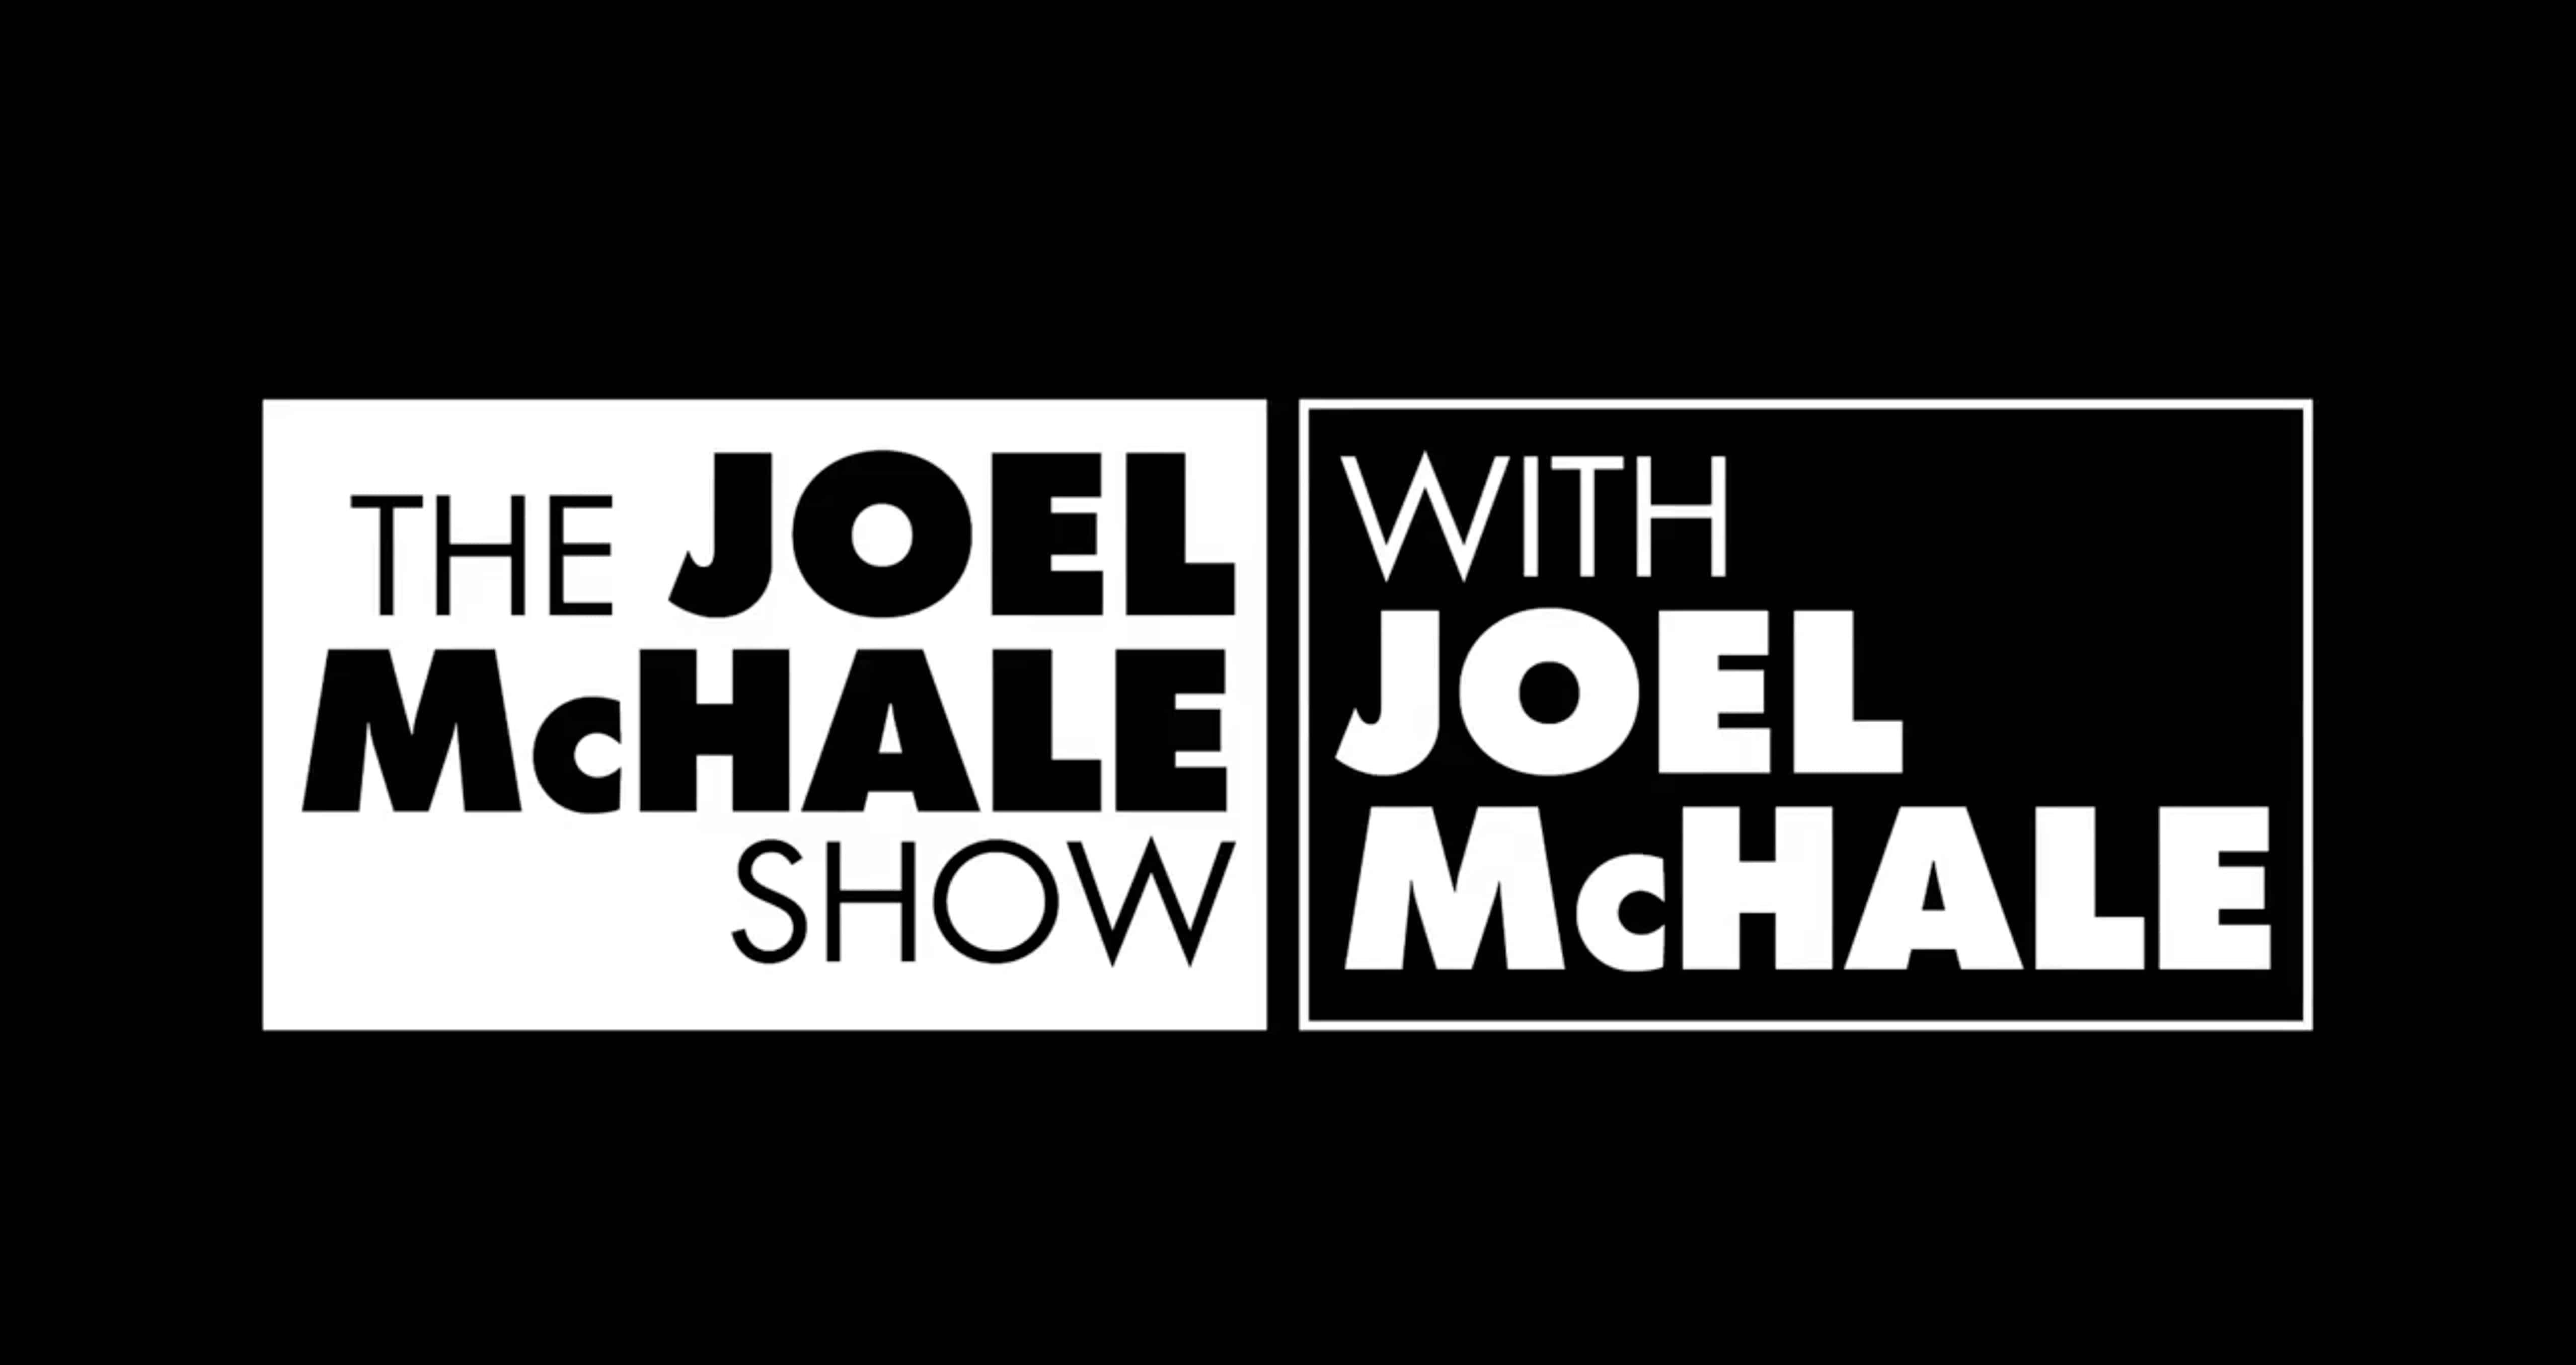 The Joel McHale Show Logo (1)